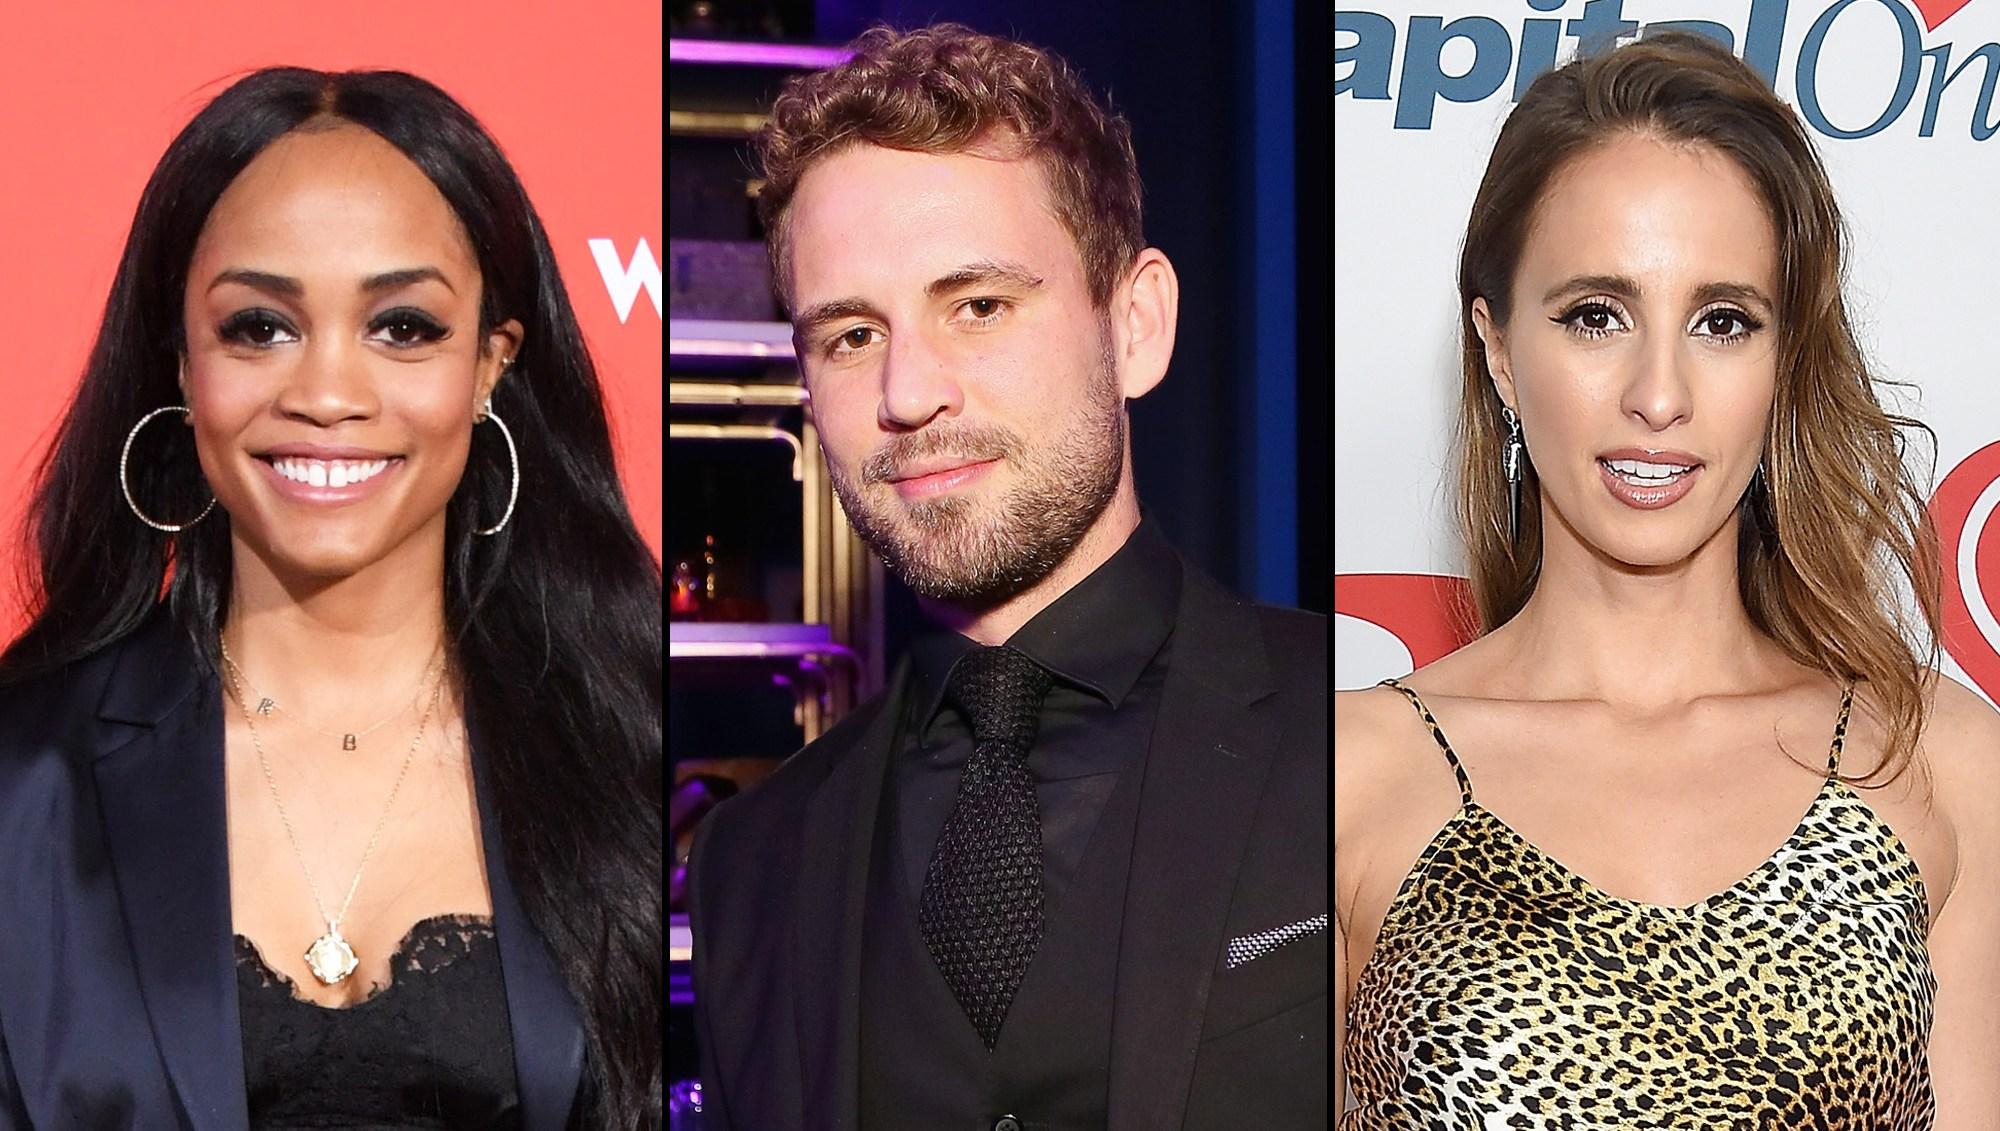 Bachelor Nation Rachel Lindsay Always Knew Nick Viall Was Going to Pick Vanessa Grimaldi